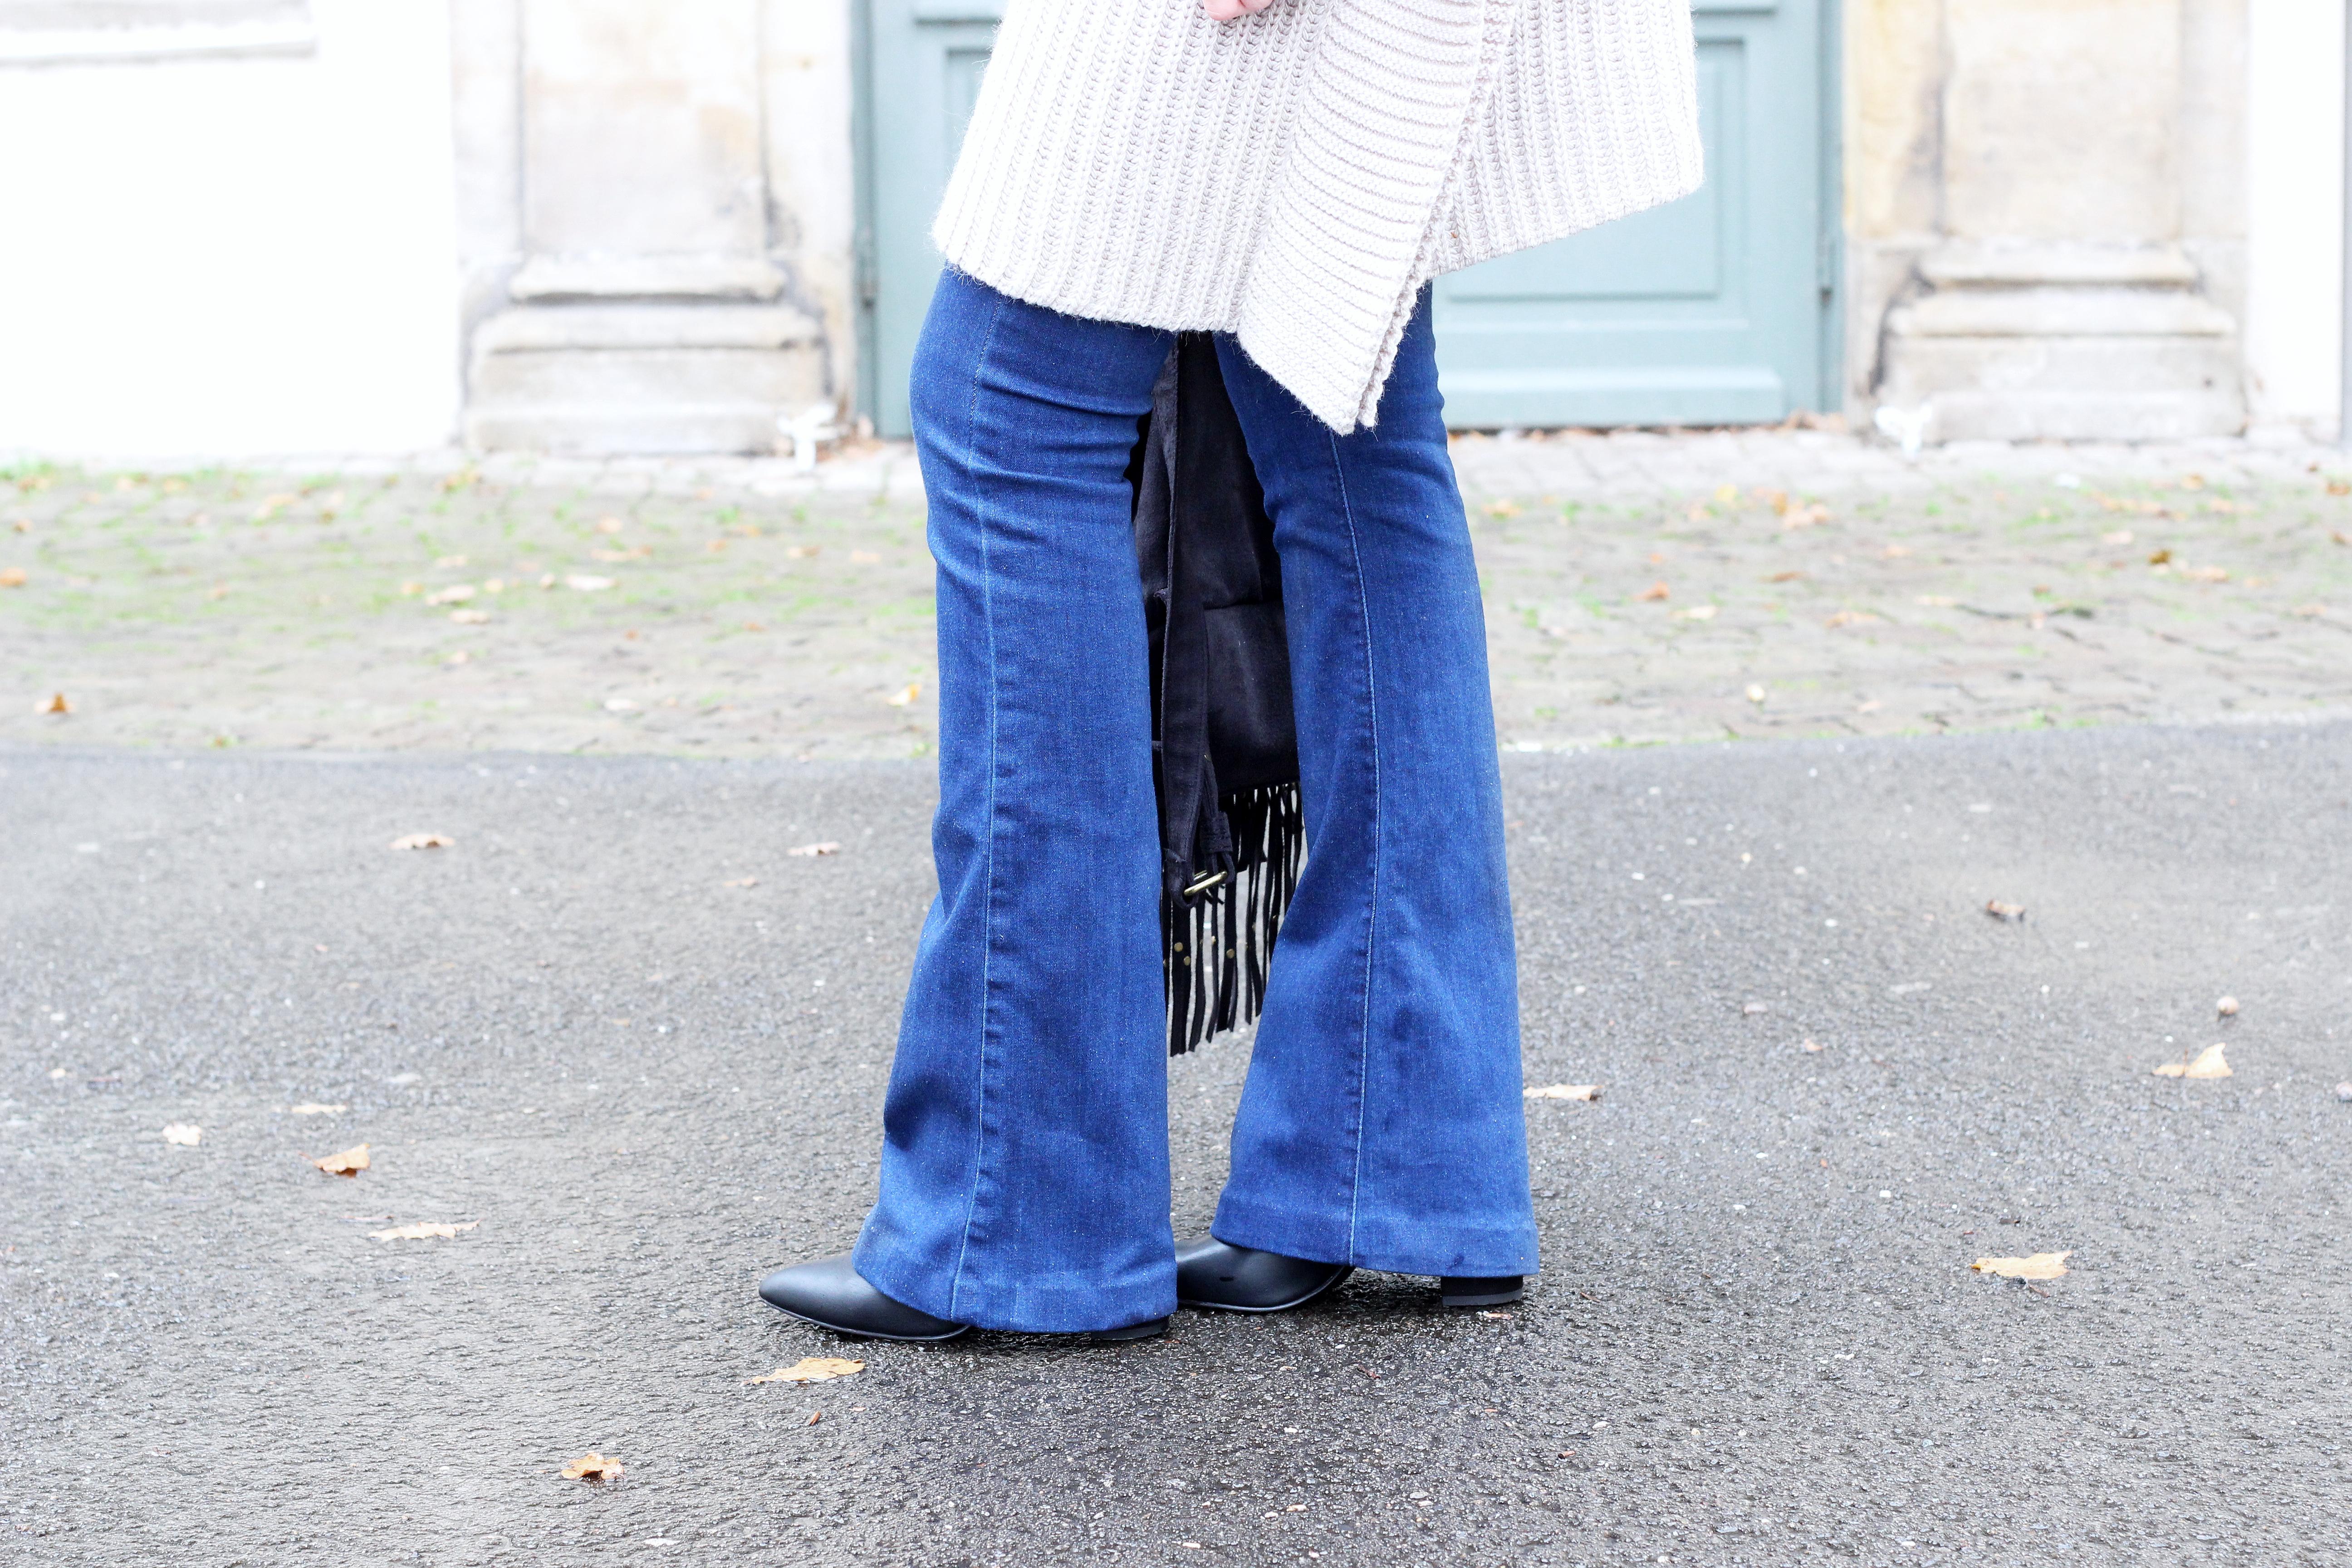 bezaubernde nana, bezauberndenana.de, fashionblog, modeblog, germany, deutschland, must-haves für den herbst, herbst trends 2015, flared jeans, schlaghose, flared jeans glamorous